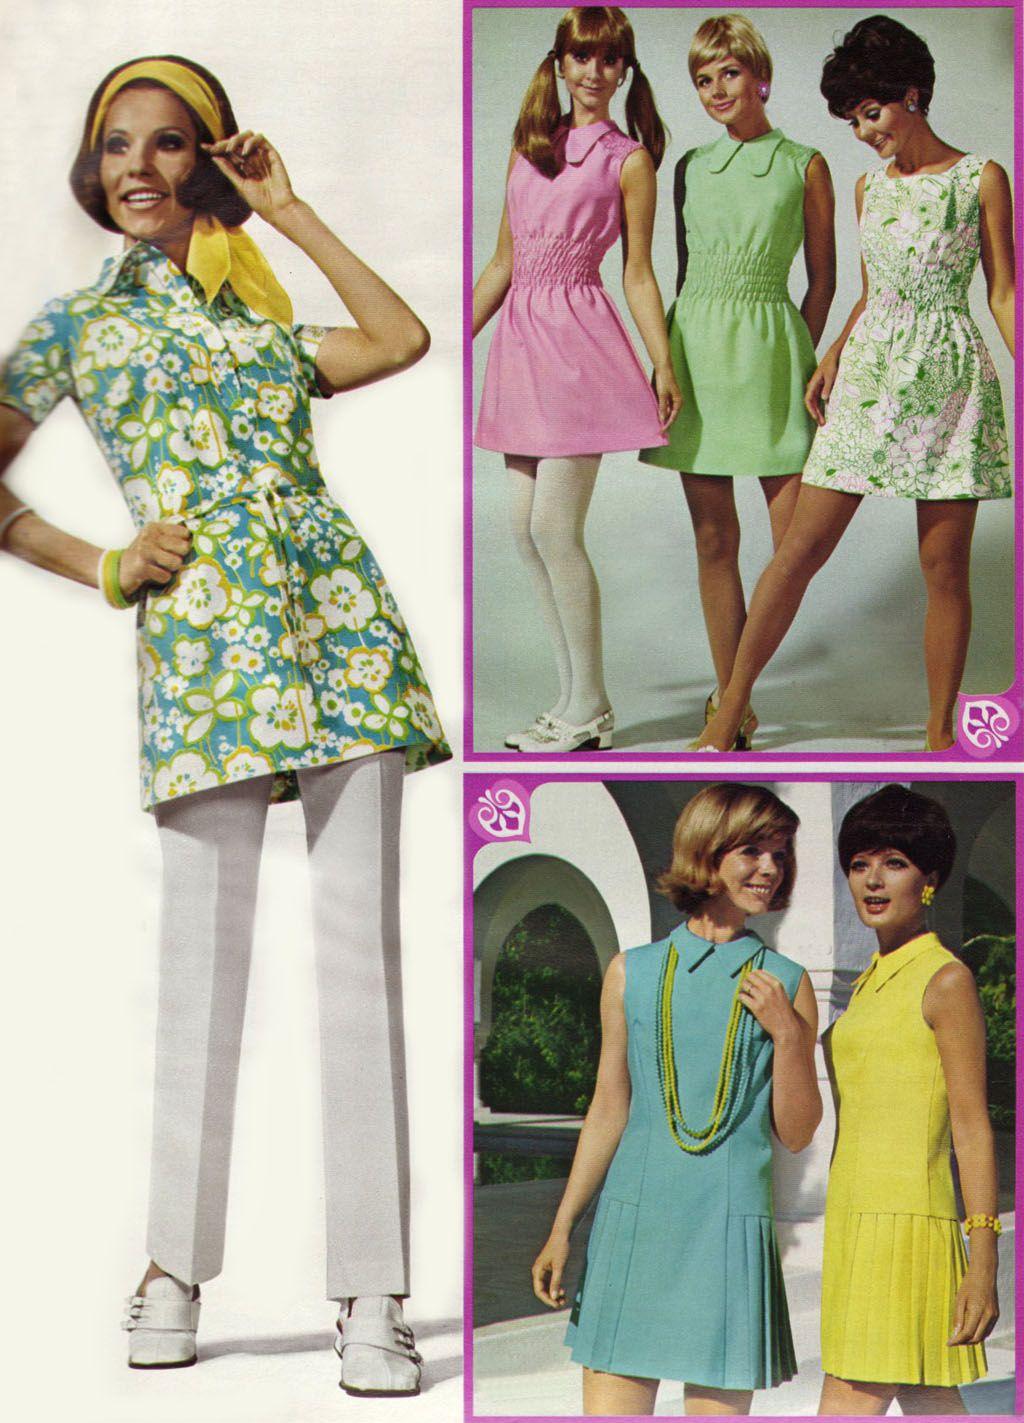 Fashion for Women. 1970 | 1975 women's fashion | Pinterest ...